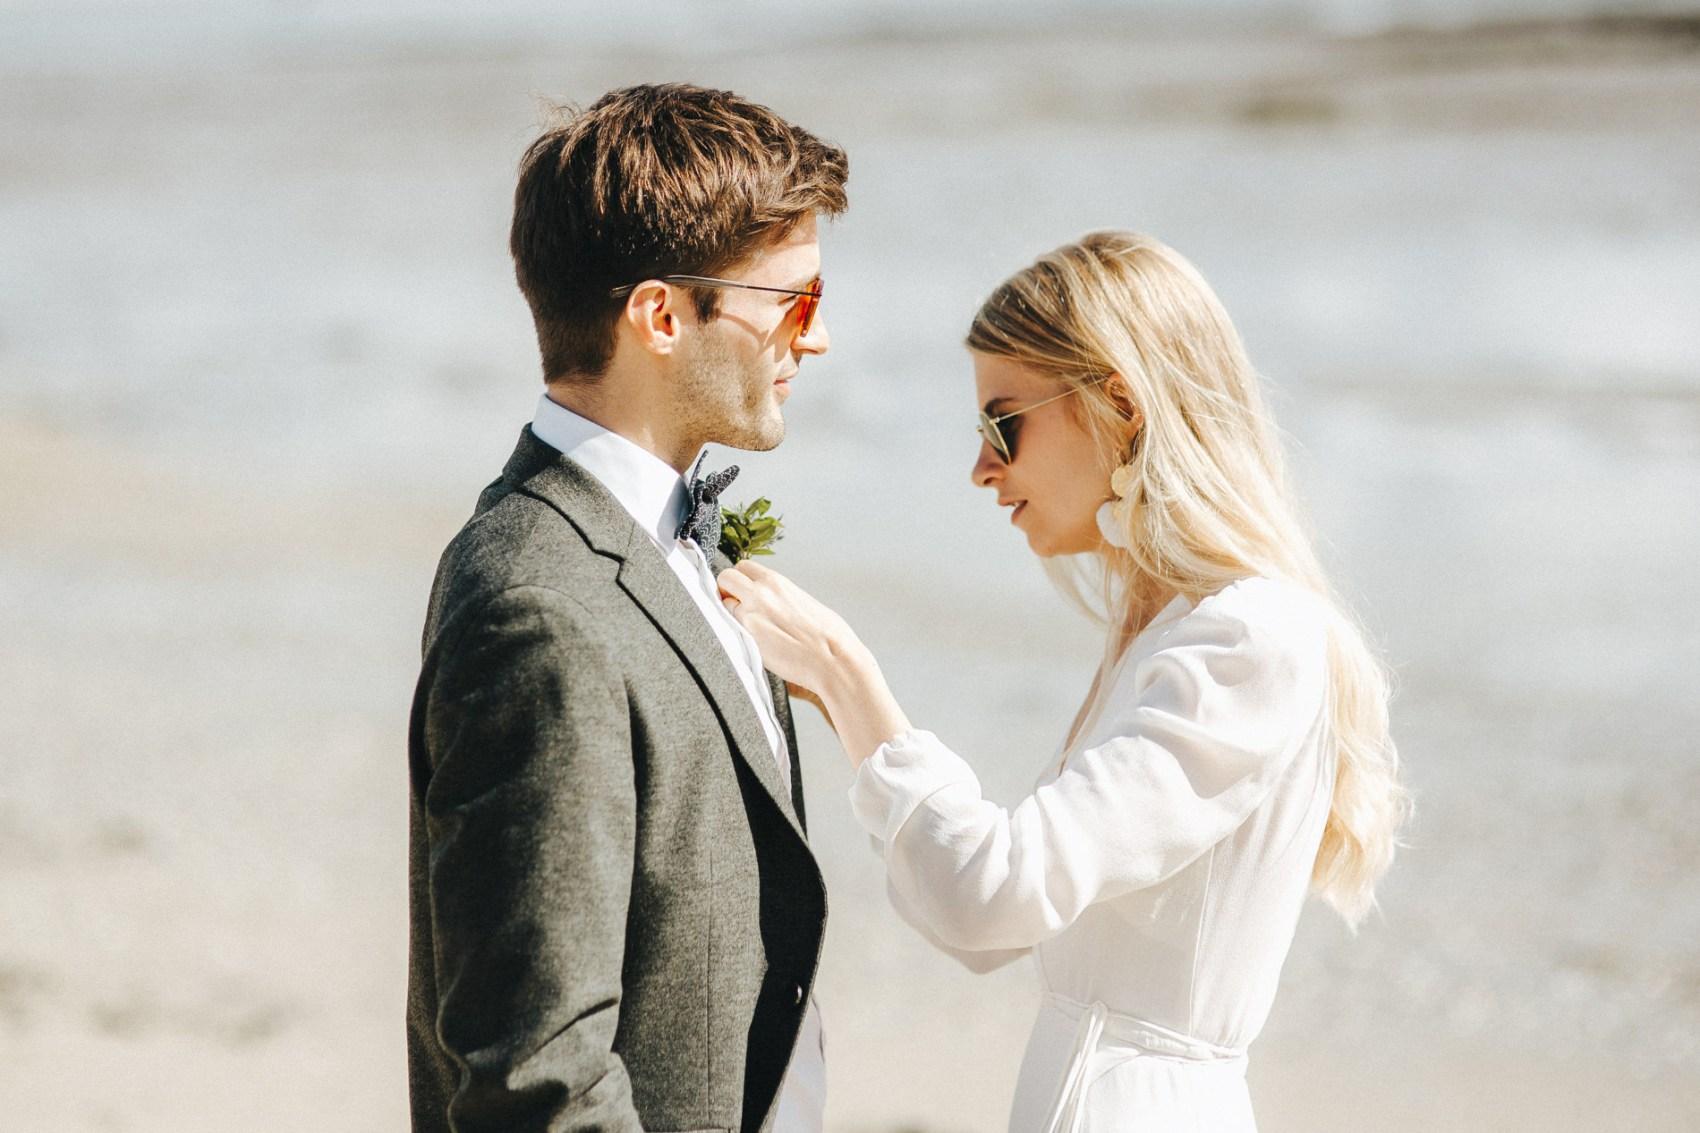 intimate-wedding-la-baule-pouliguen-mariage-67.jpg